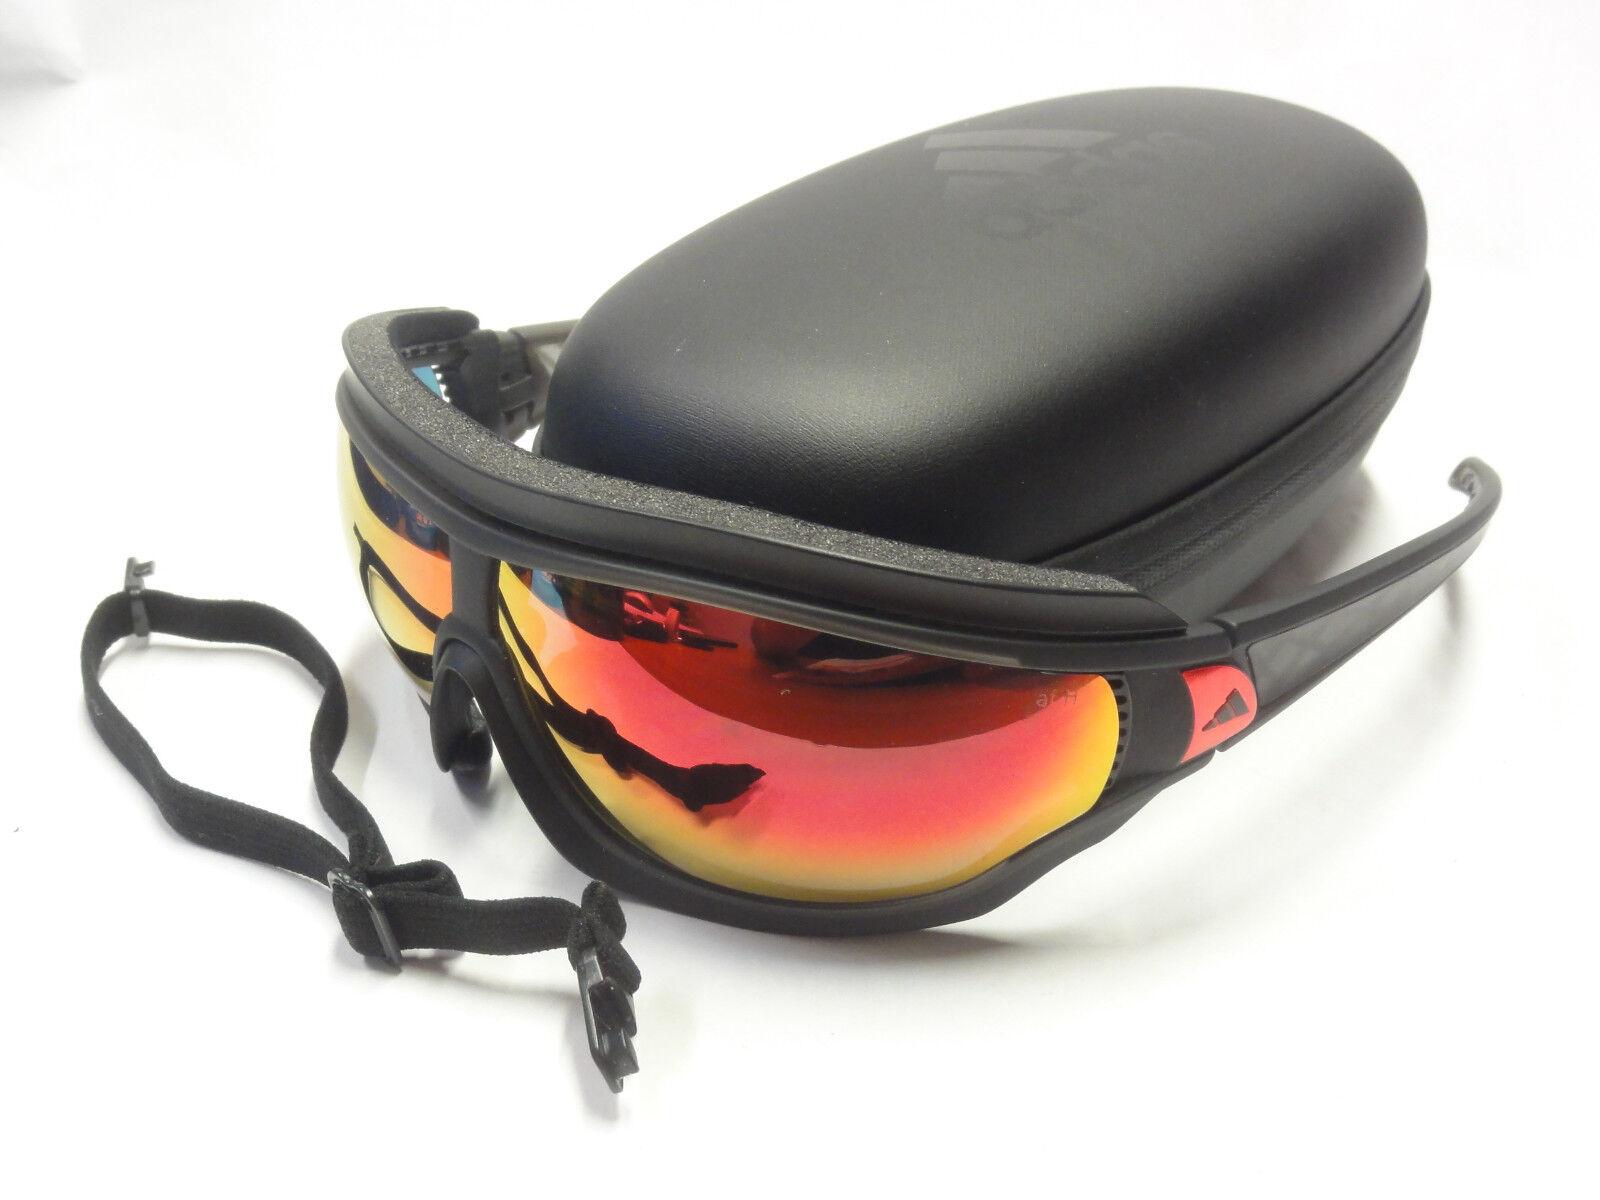 Adidas Sportbrille Tycane pro outdoor L a196 6055 matt black neu OVP